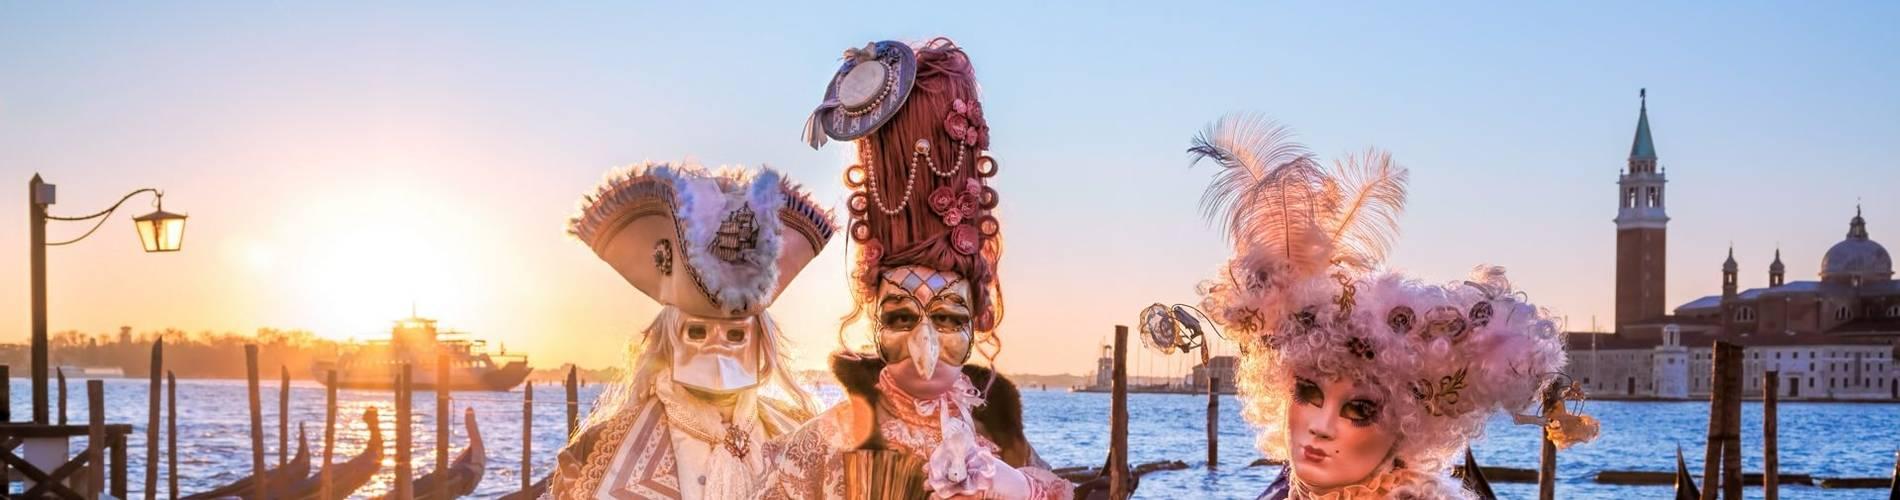 Venice 1.jpg